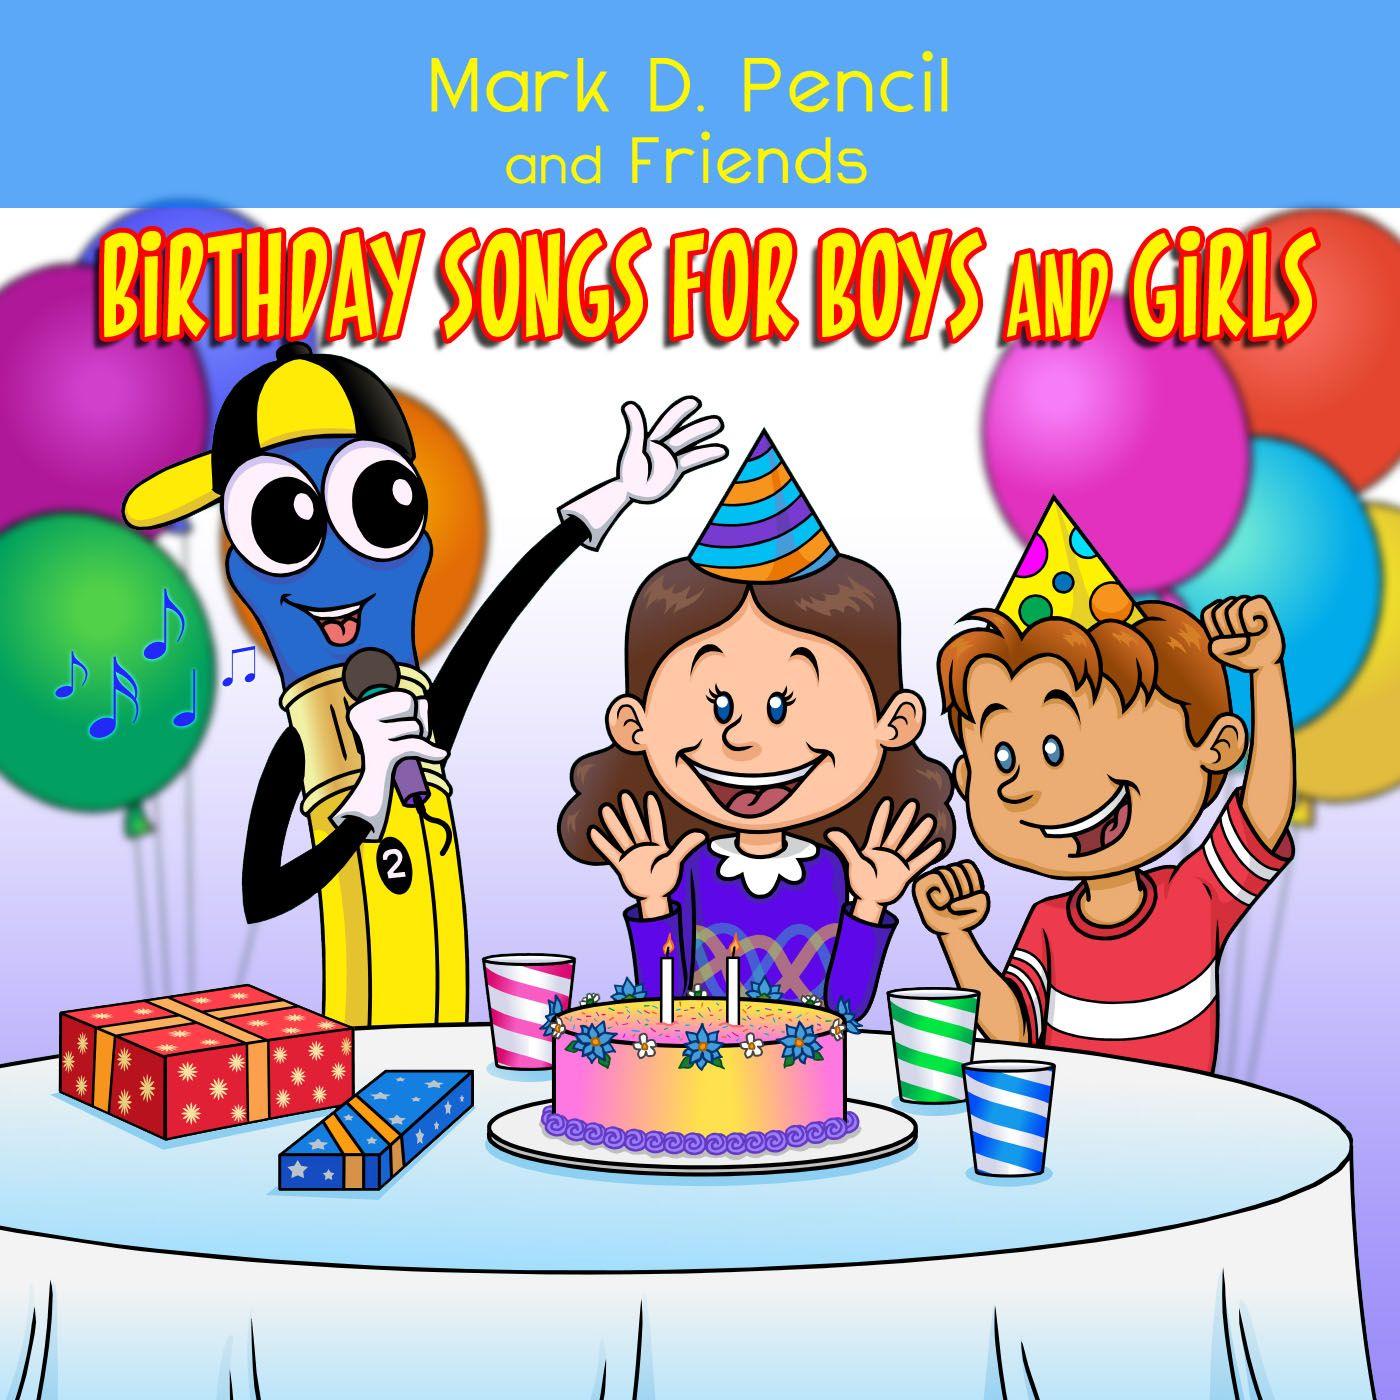 Feliz Cumpleanos Chica Happy Birthday Girl Mark D Pencil Youtube Birthday Songs Happy Birthday Boy Happy Birthday Girls